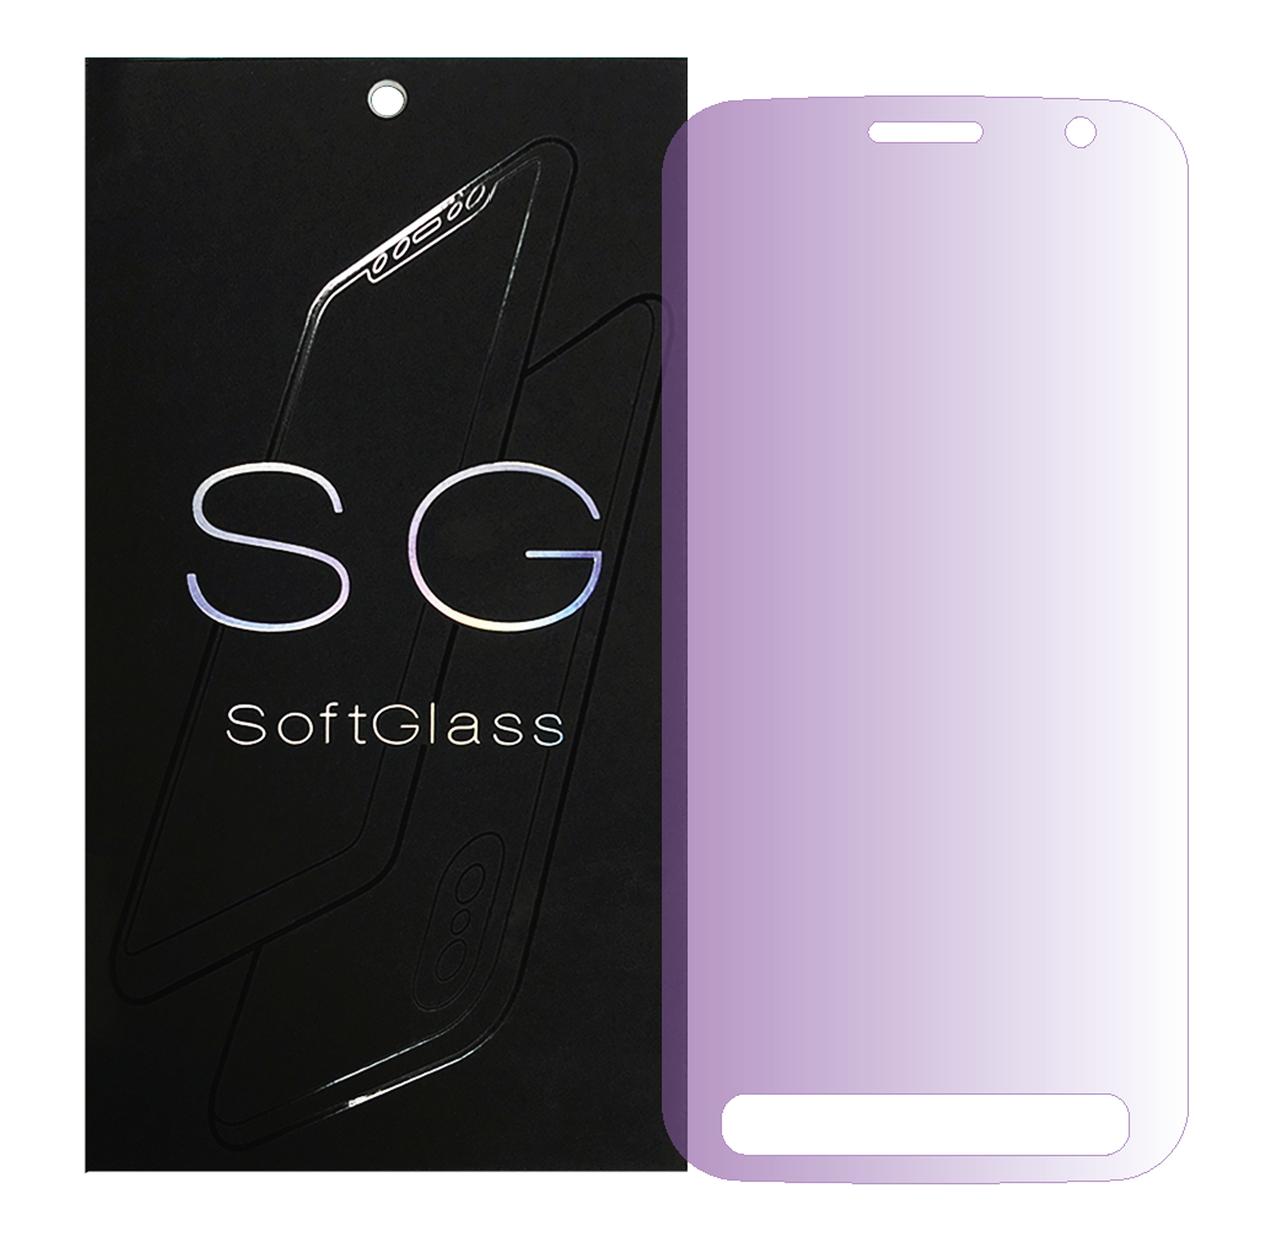 Поліуретанова плівка Samsung Xcover 4 G390 SoftGlass Екран